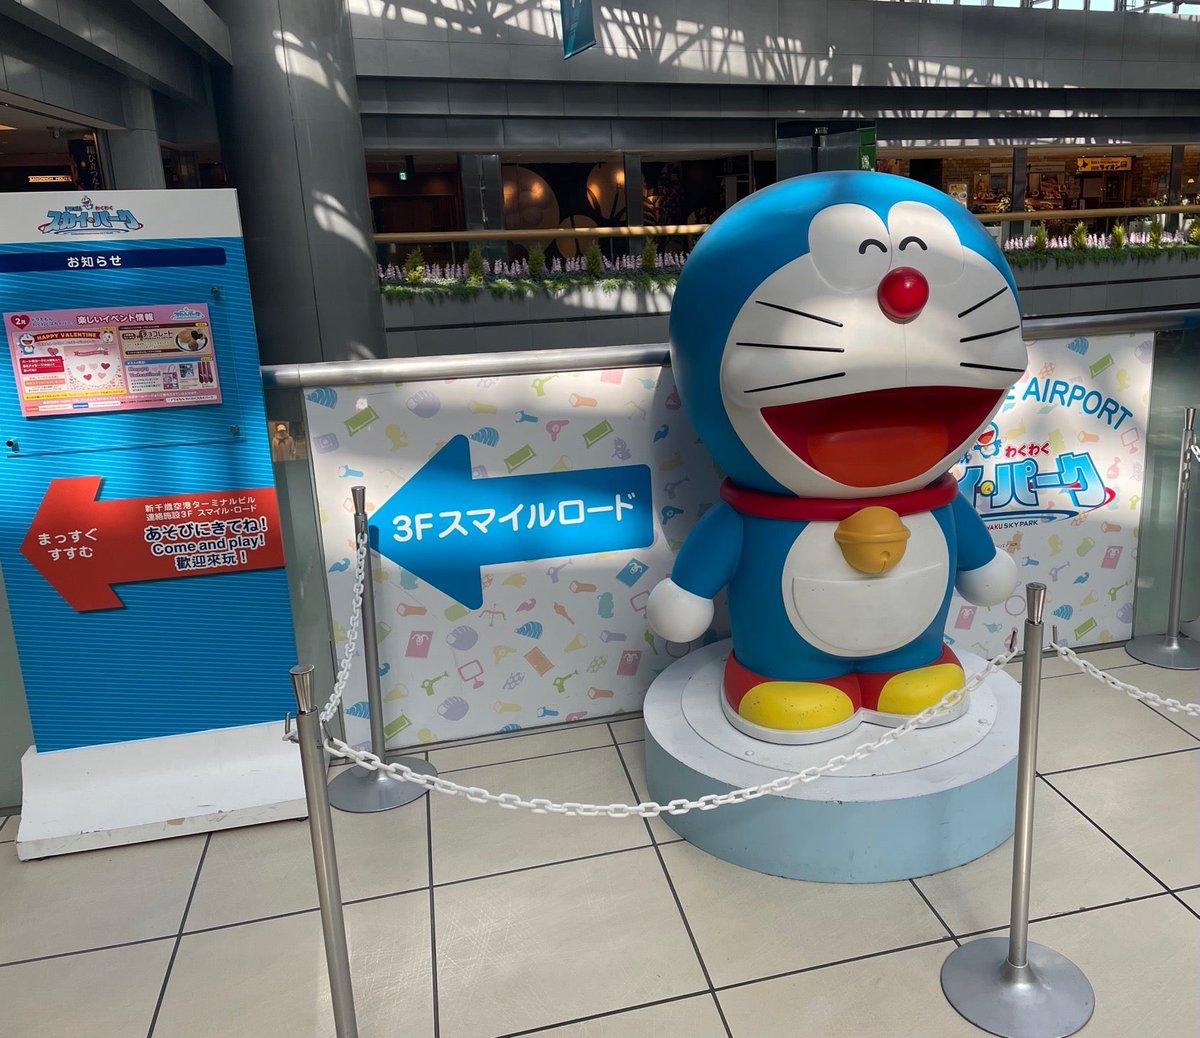 test ツイッターメディア - I'm at 新千歳空港 - @chitose_info in 千歳市, 北海道 https://t.co/YY9bjXAkY1 https://t.co/xpmu9mMOH5